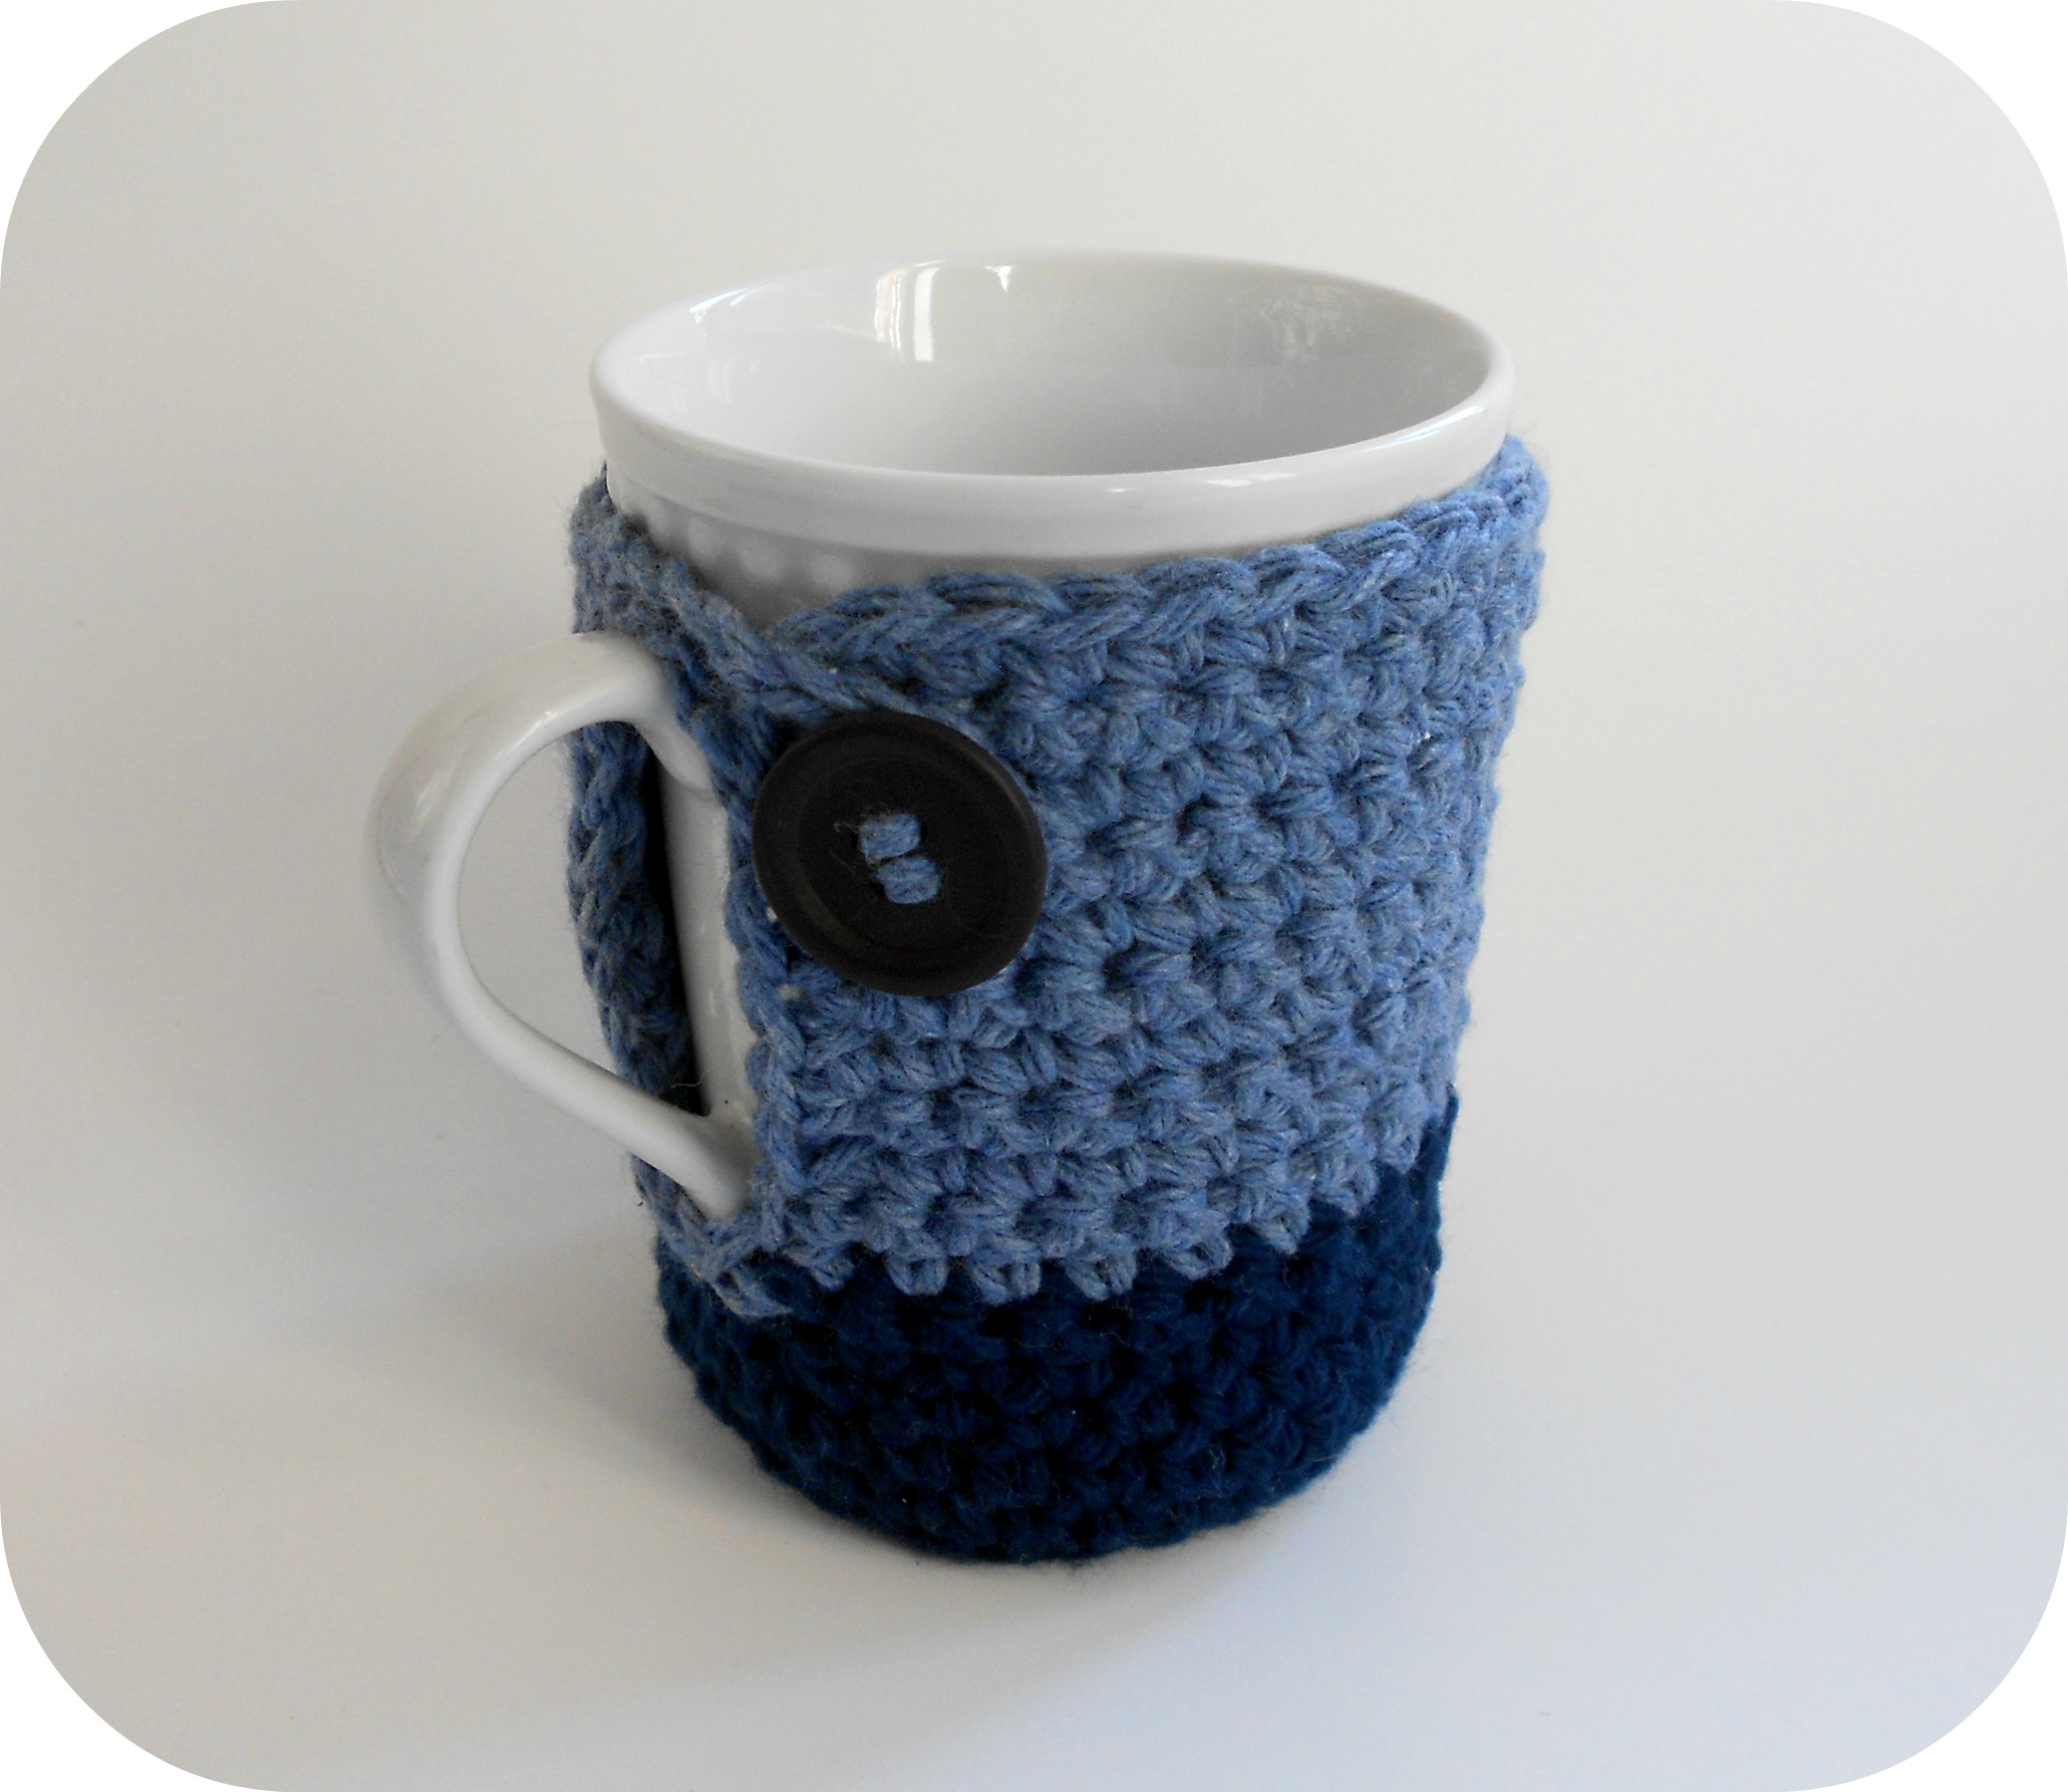 A Crochet Pattern For Tea And Coffee Lovers Mug Cozy Hookabee